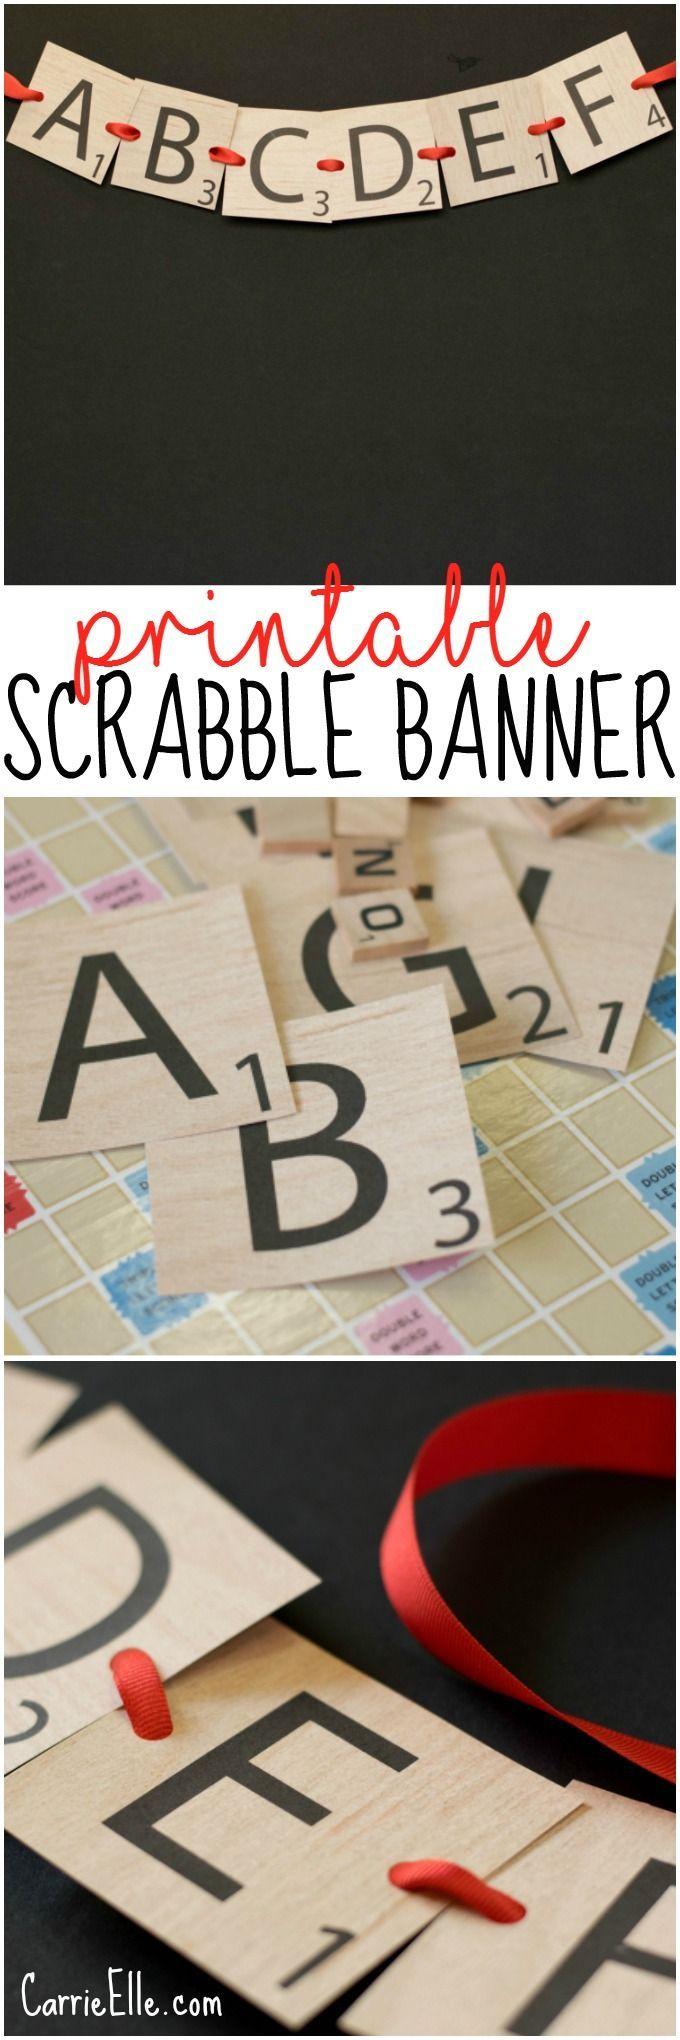 Scrabble Letter Printable Banner  Mommy Solutions